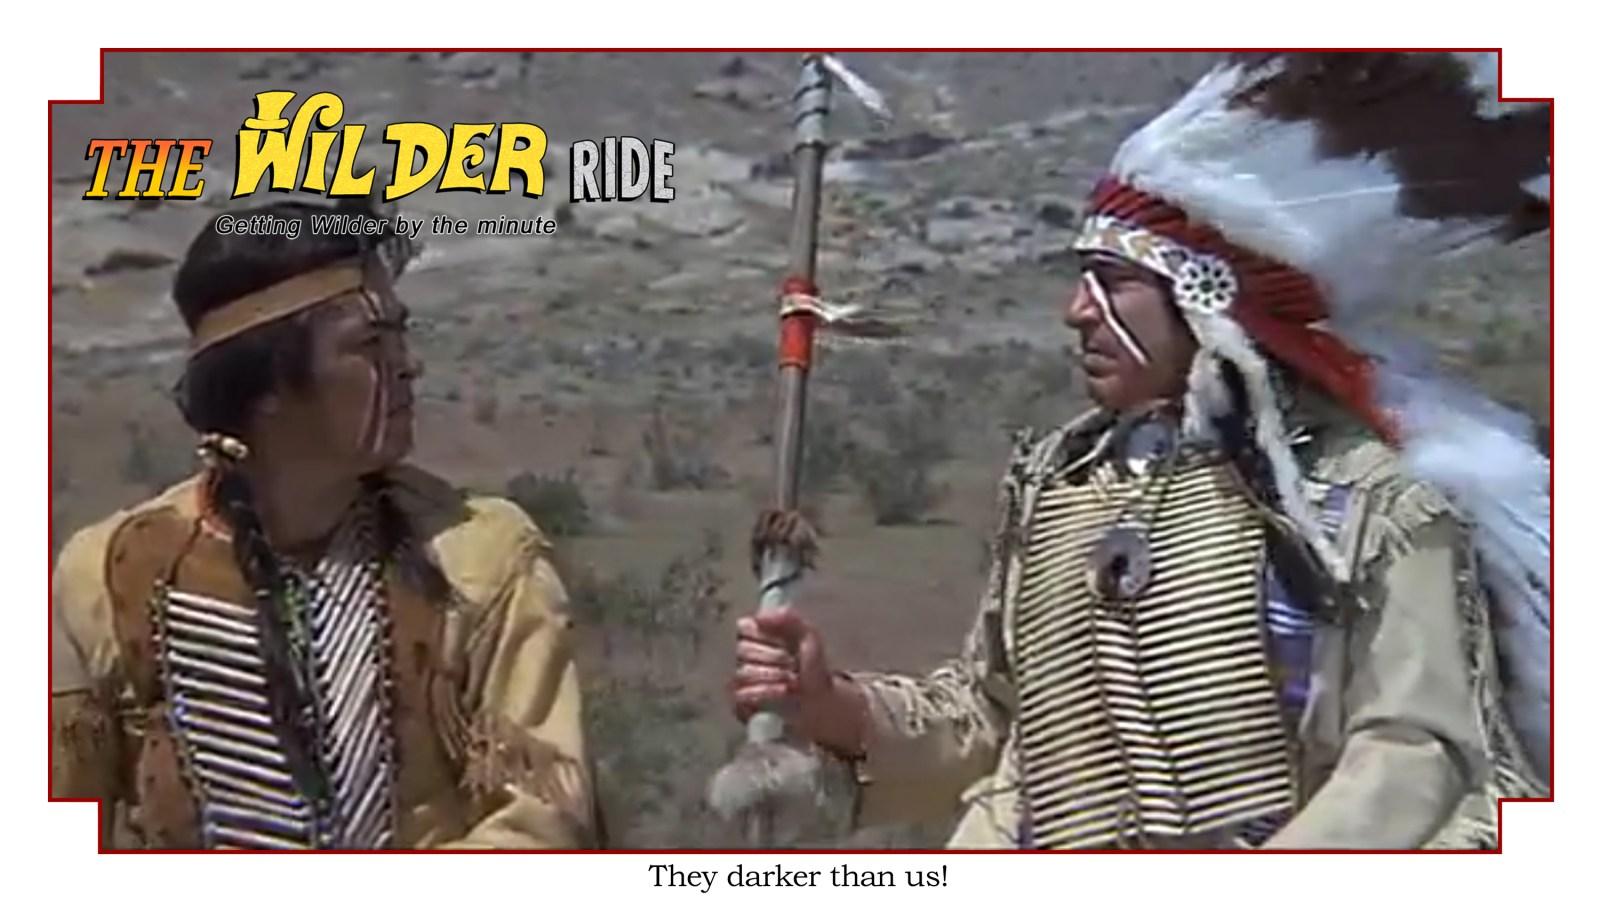 They darker than us - Blazing Saddles